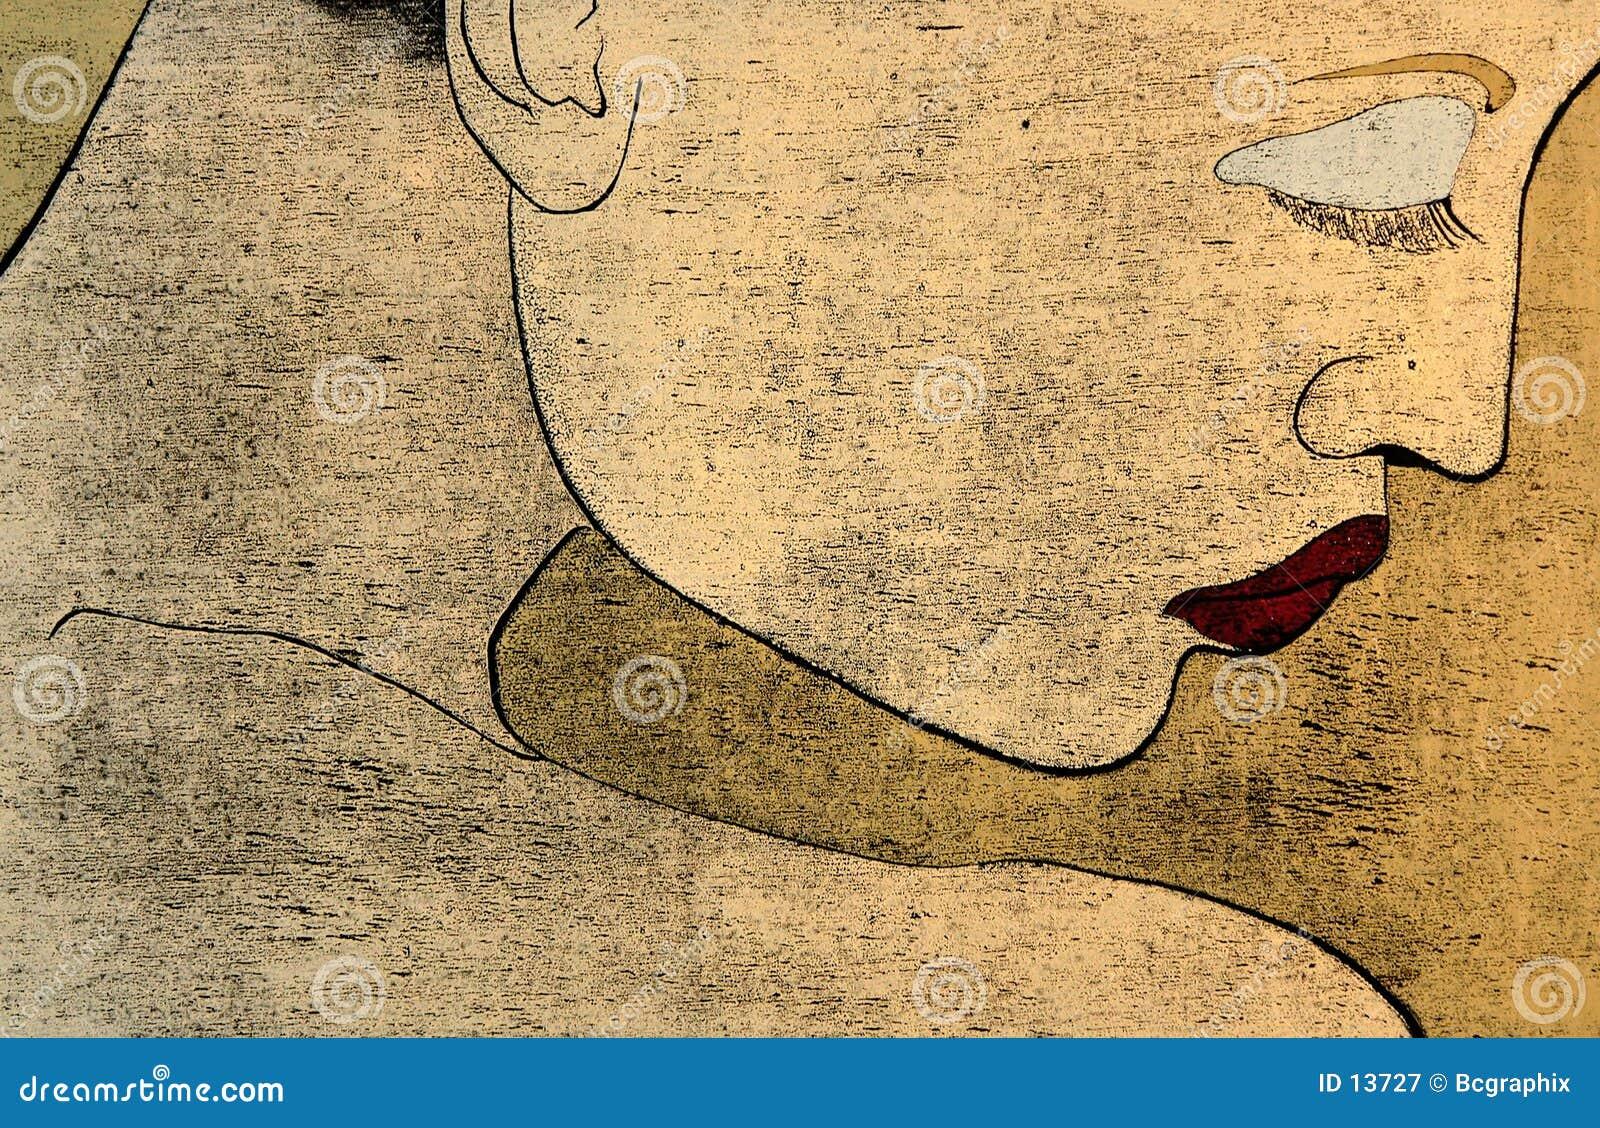 Woodprint - portait de una mujer